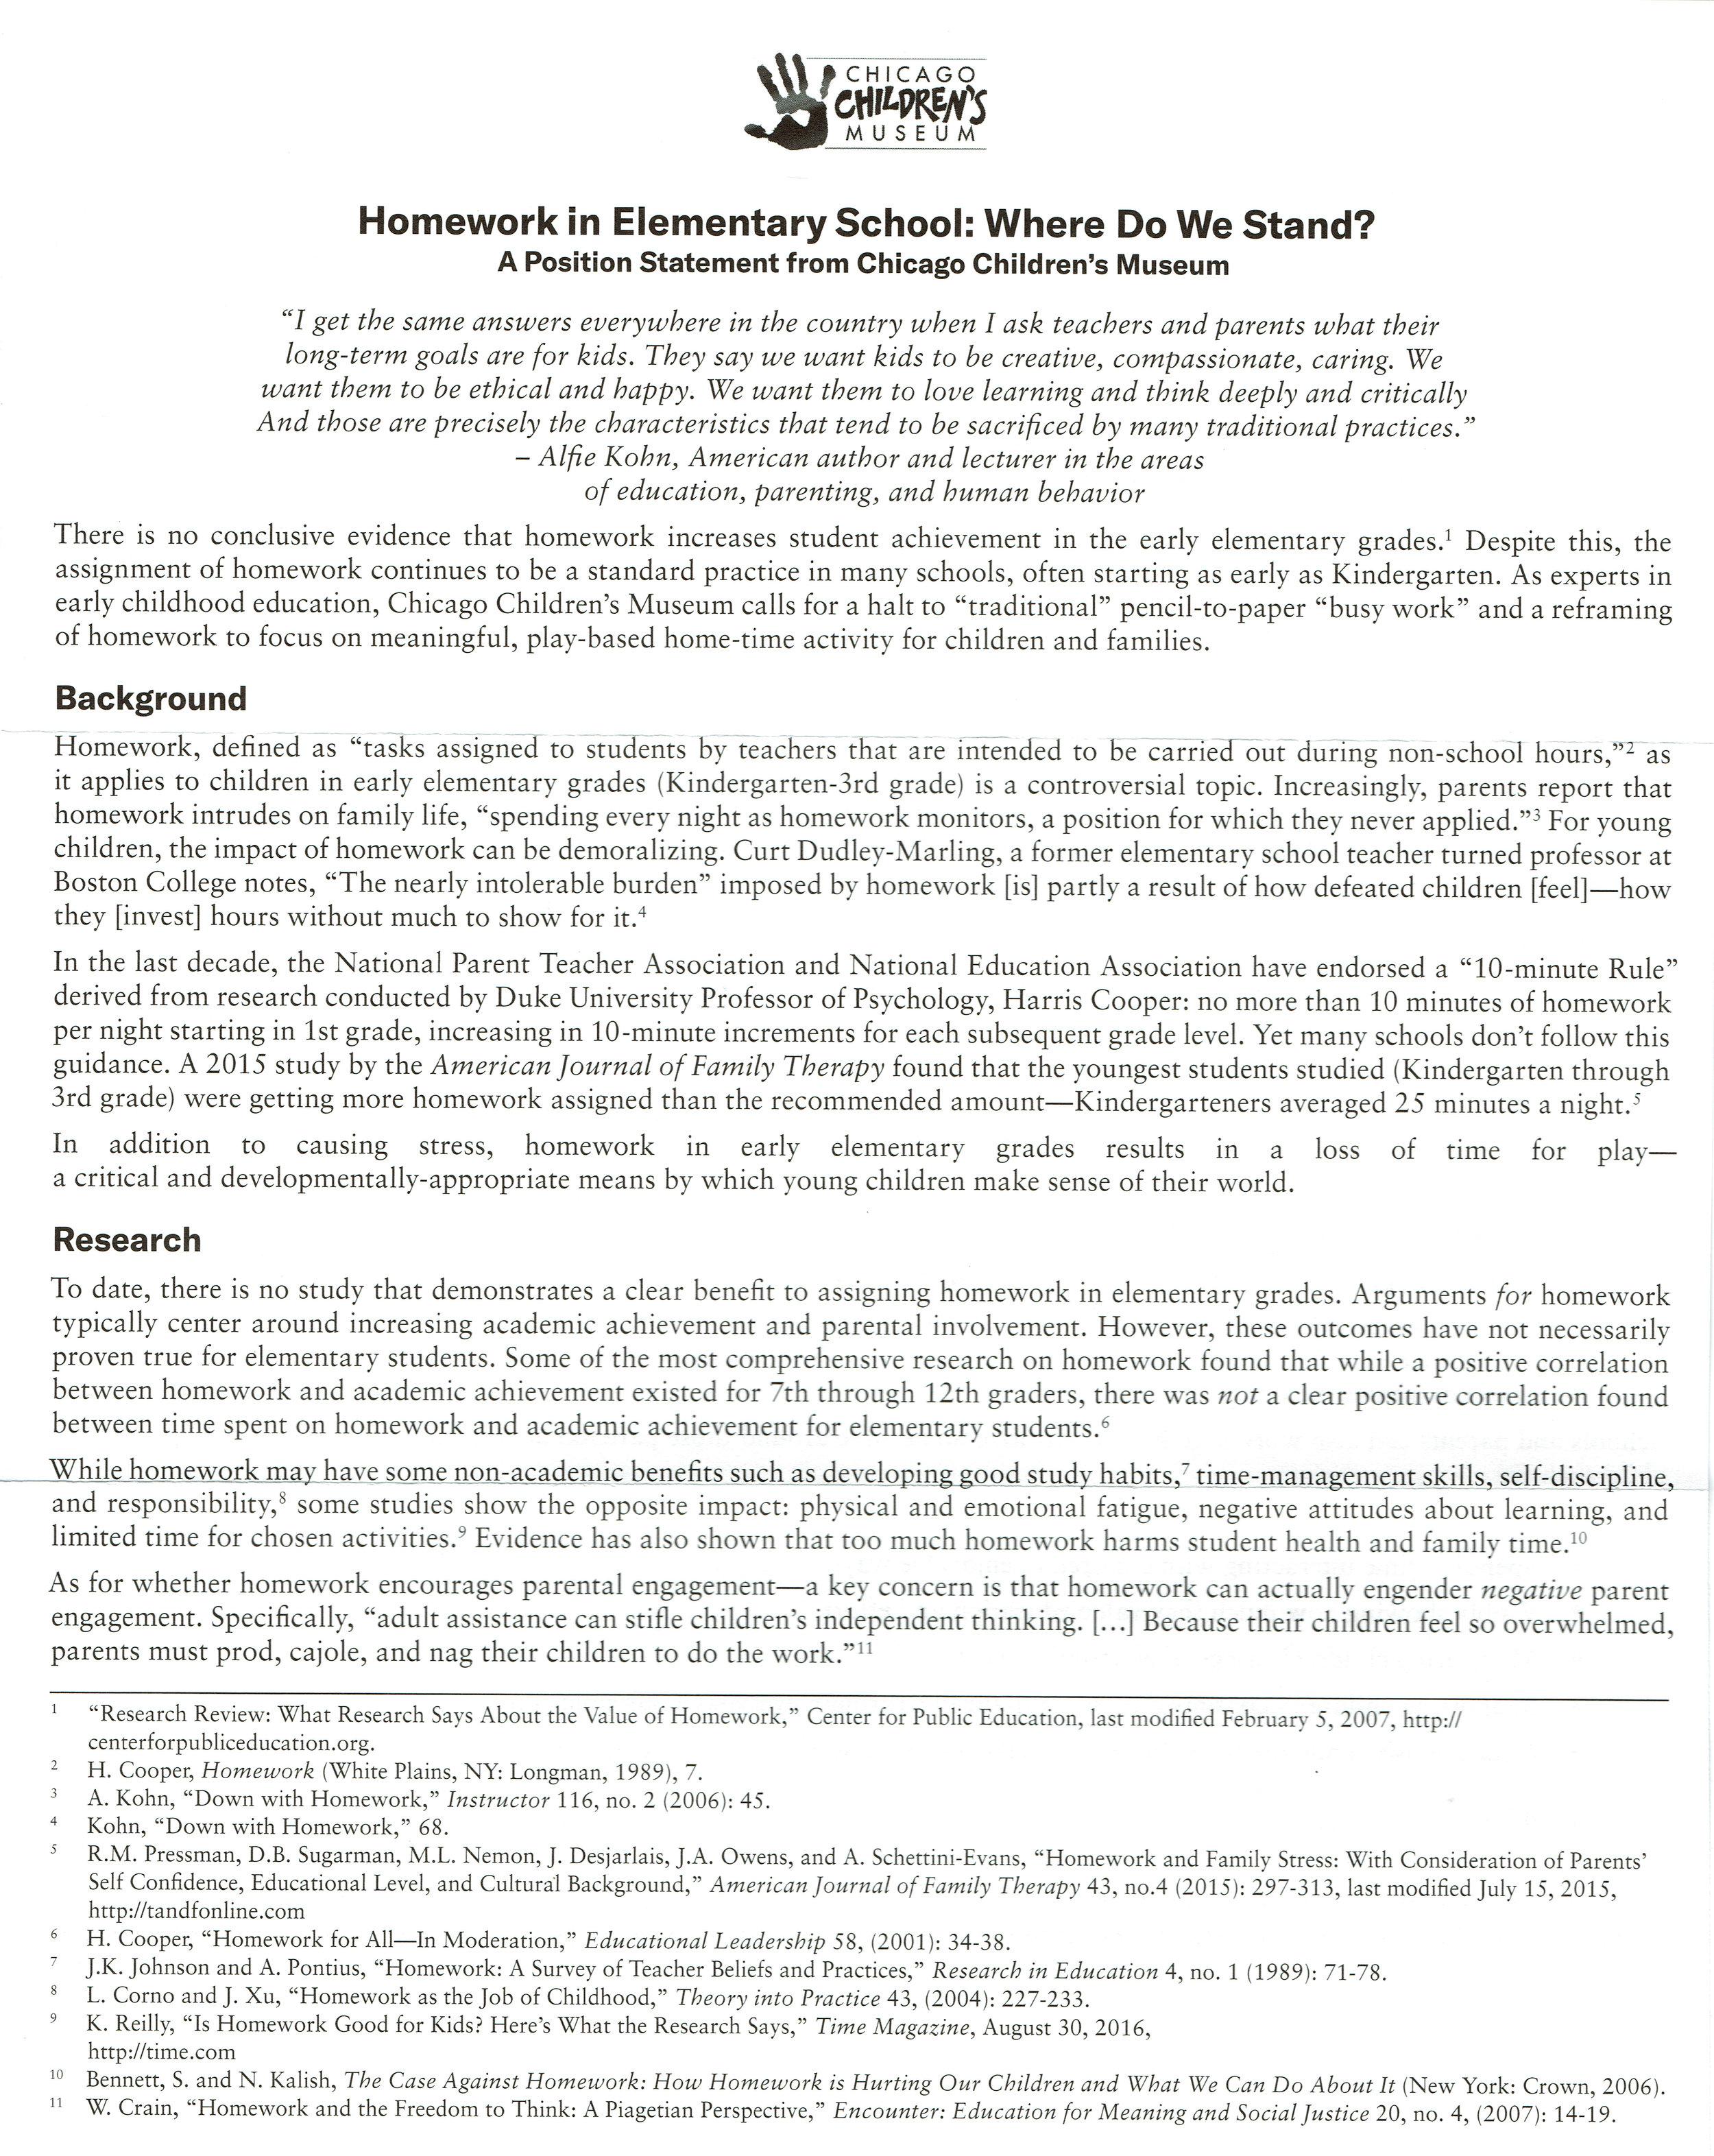 Chicago Children's Museum Position Statement (front)